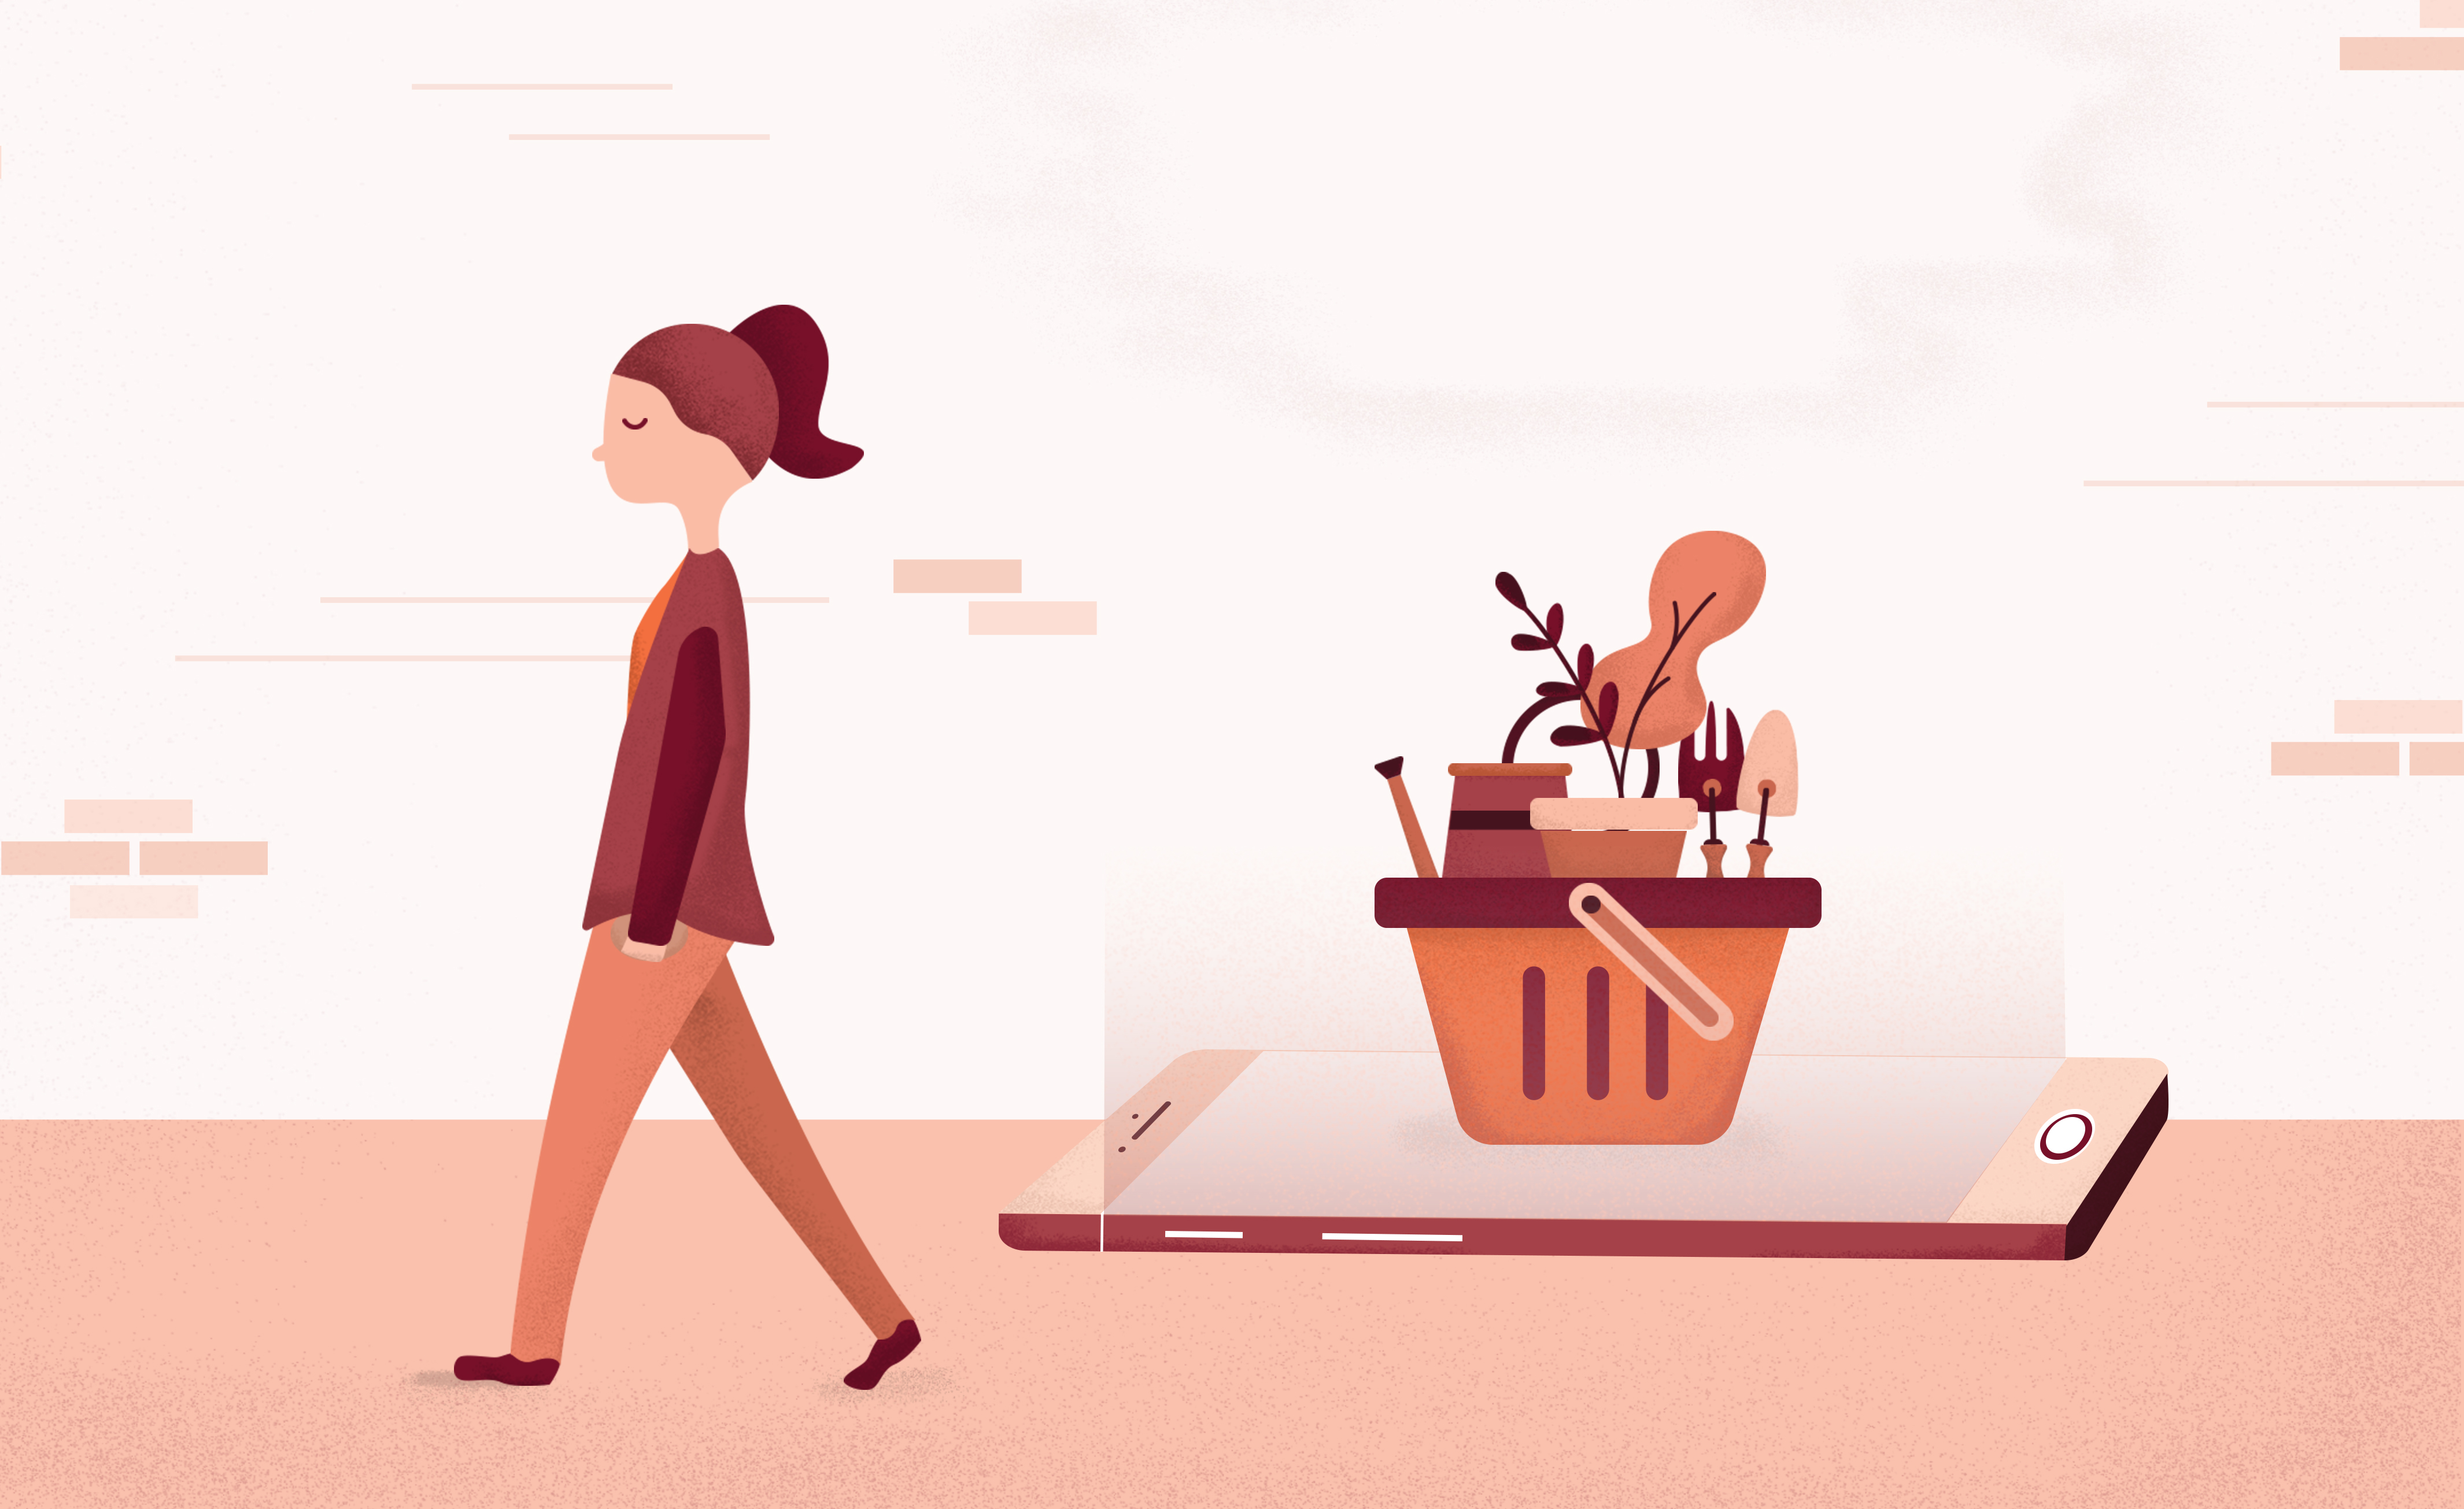 Illustration of shopper walking away from basket on ecommerce site